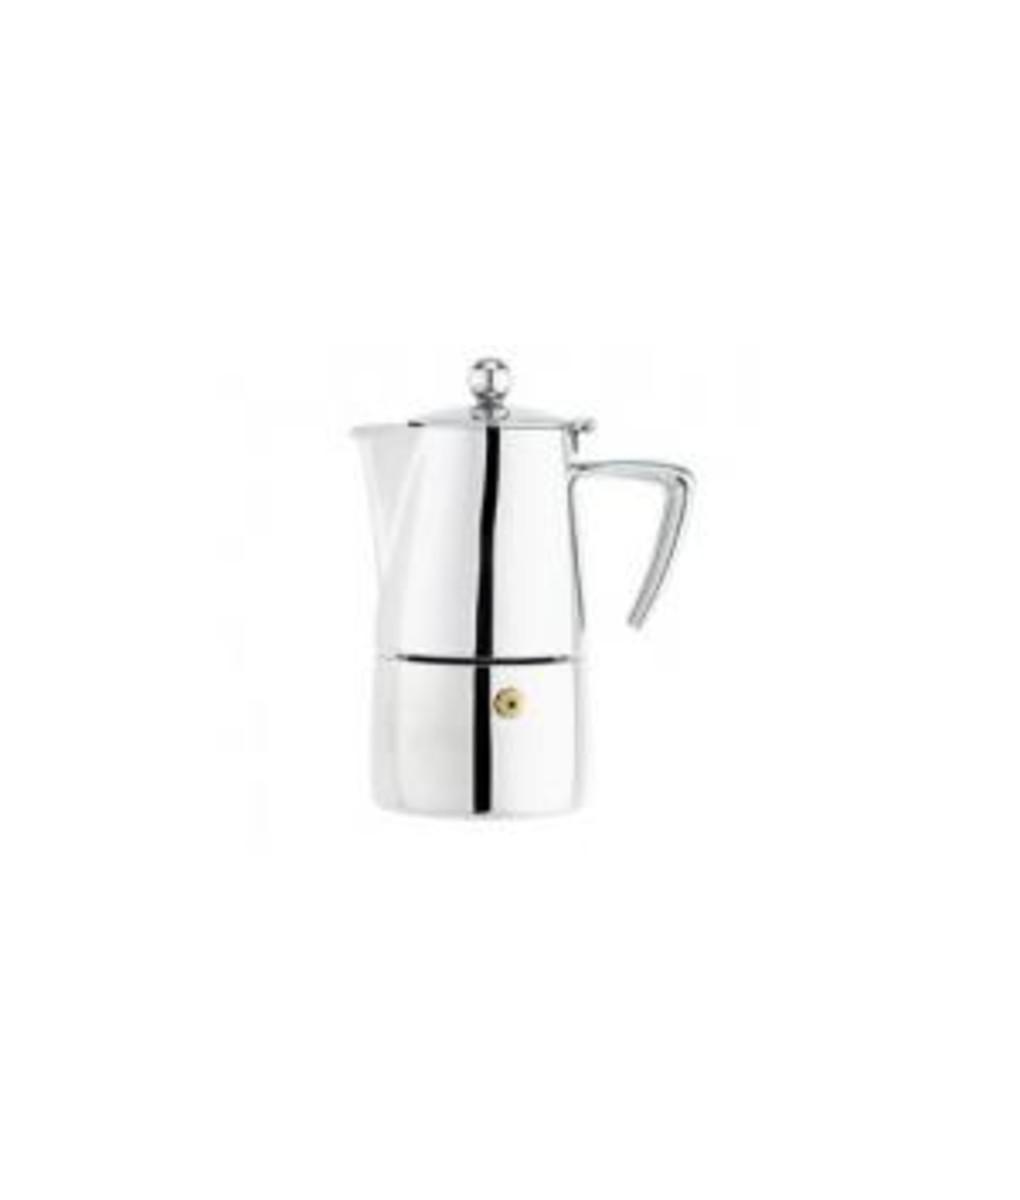 Espresso Maker 6 cup by Avanti Art Deco